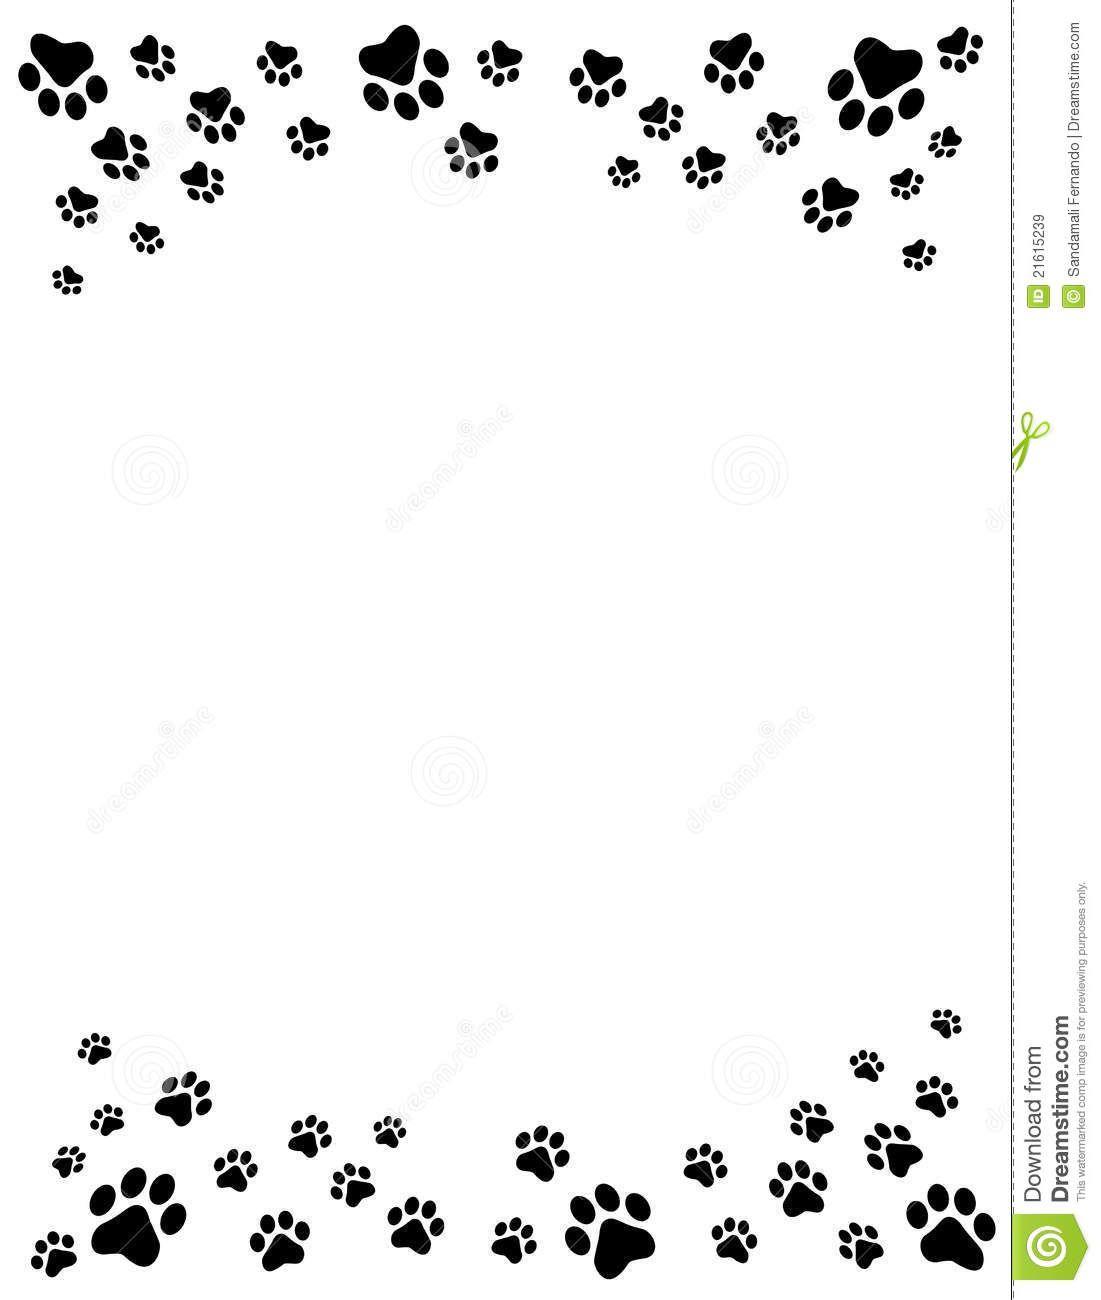 free cat clip art.